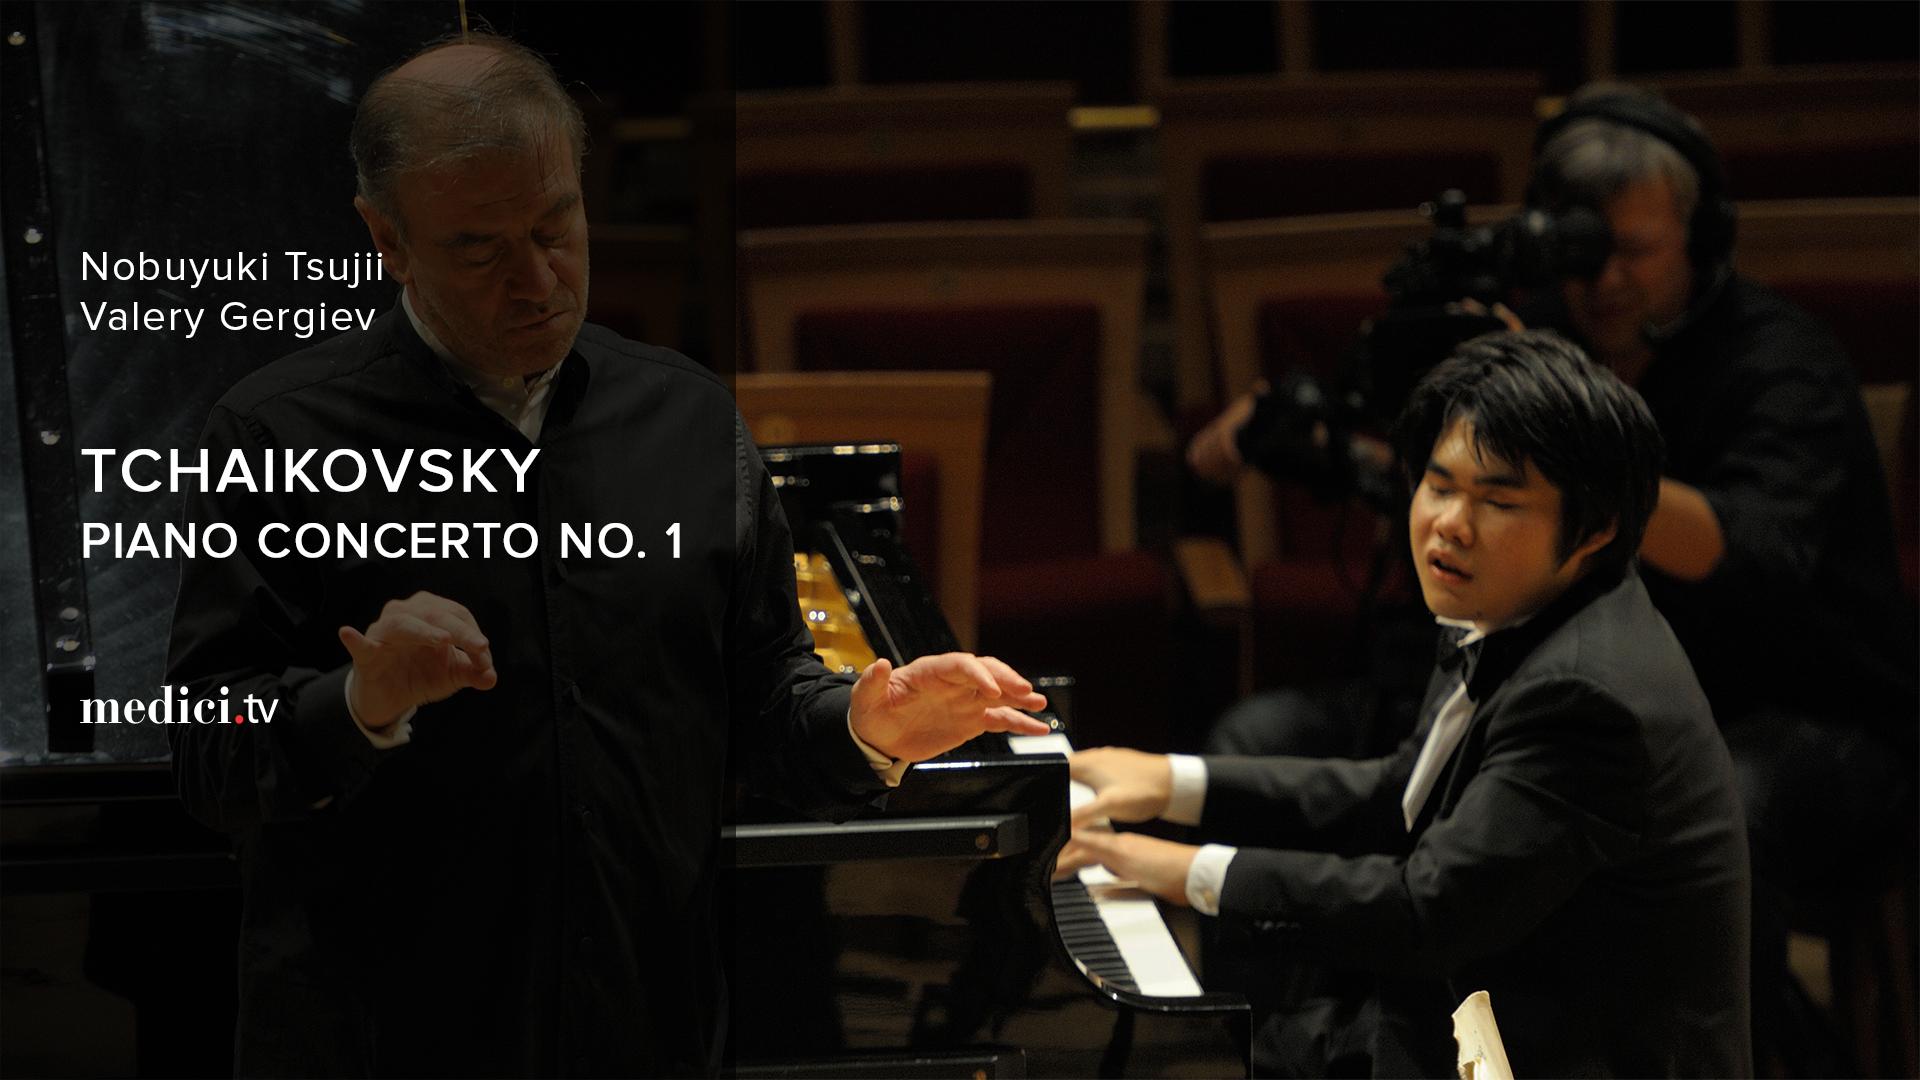 Tchaikovsky, Piano Concerto No. 1 - Nobuyuki Tsujii, Valery Gergiev - Mariinsky Theatre Orchestra